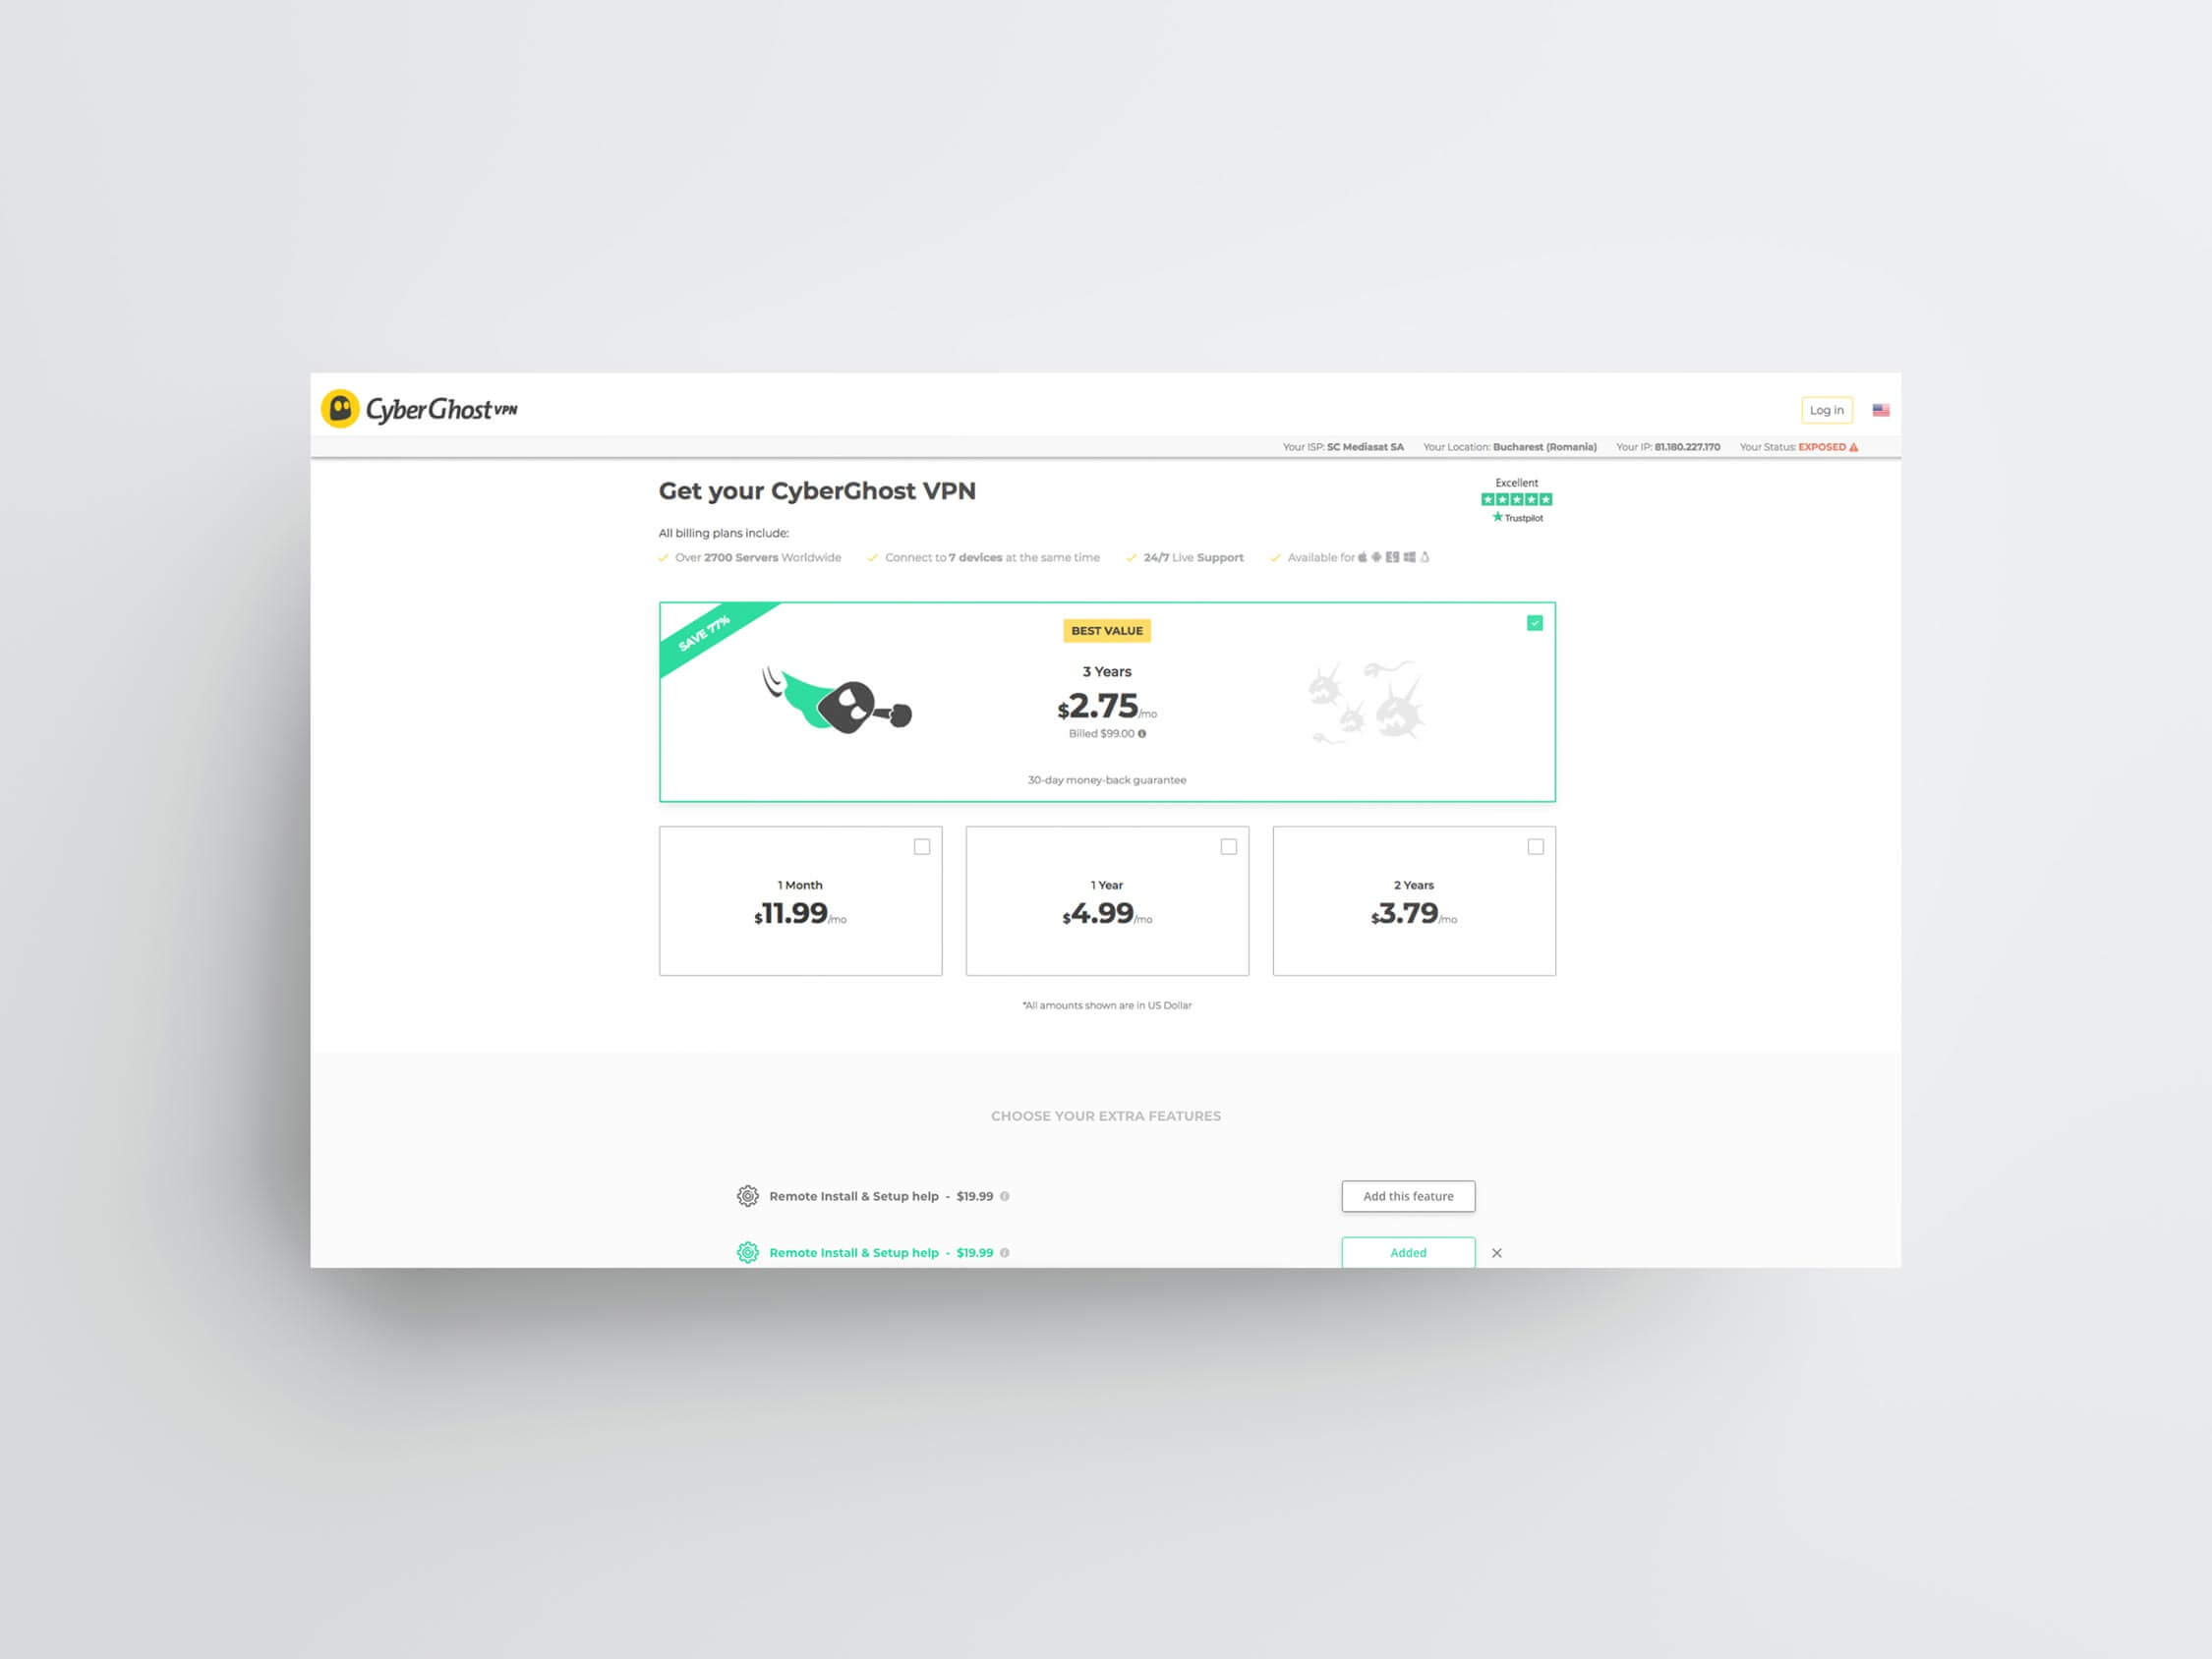 A screenshot of web page